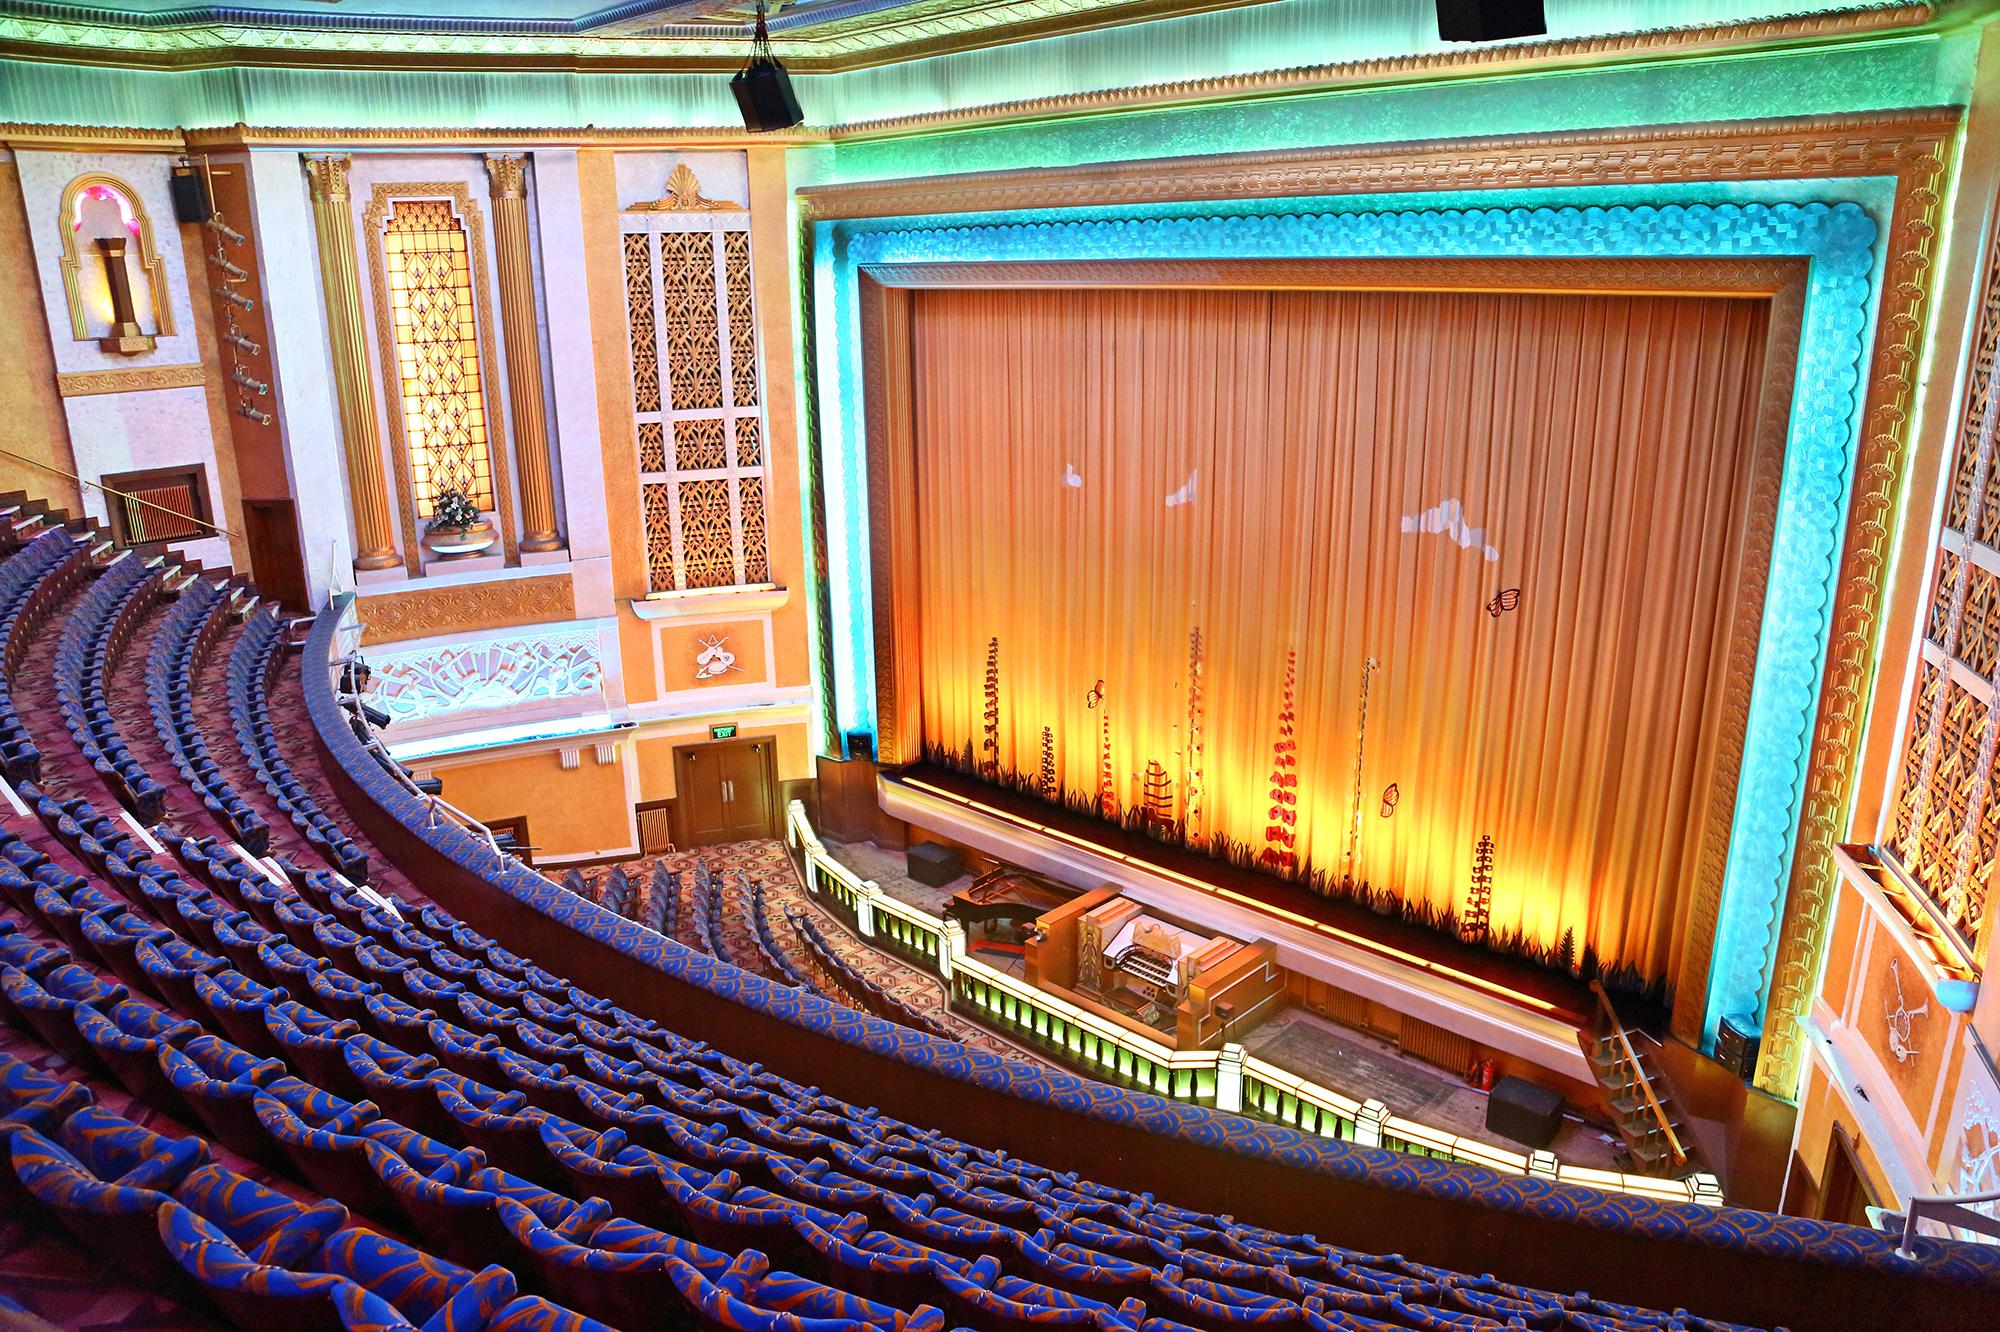 Stockport's 1932 Super Cinema is sopening its doors